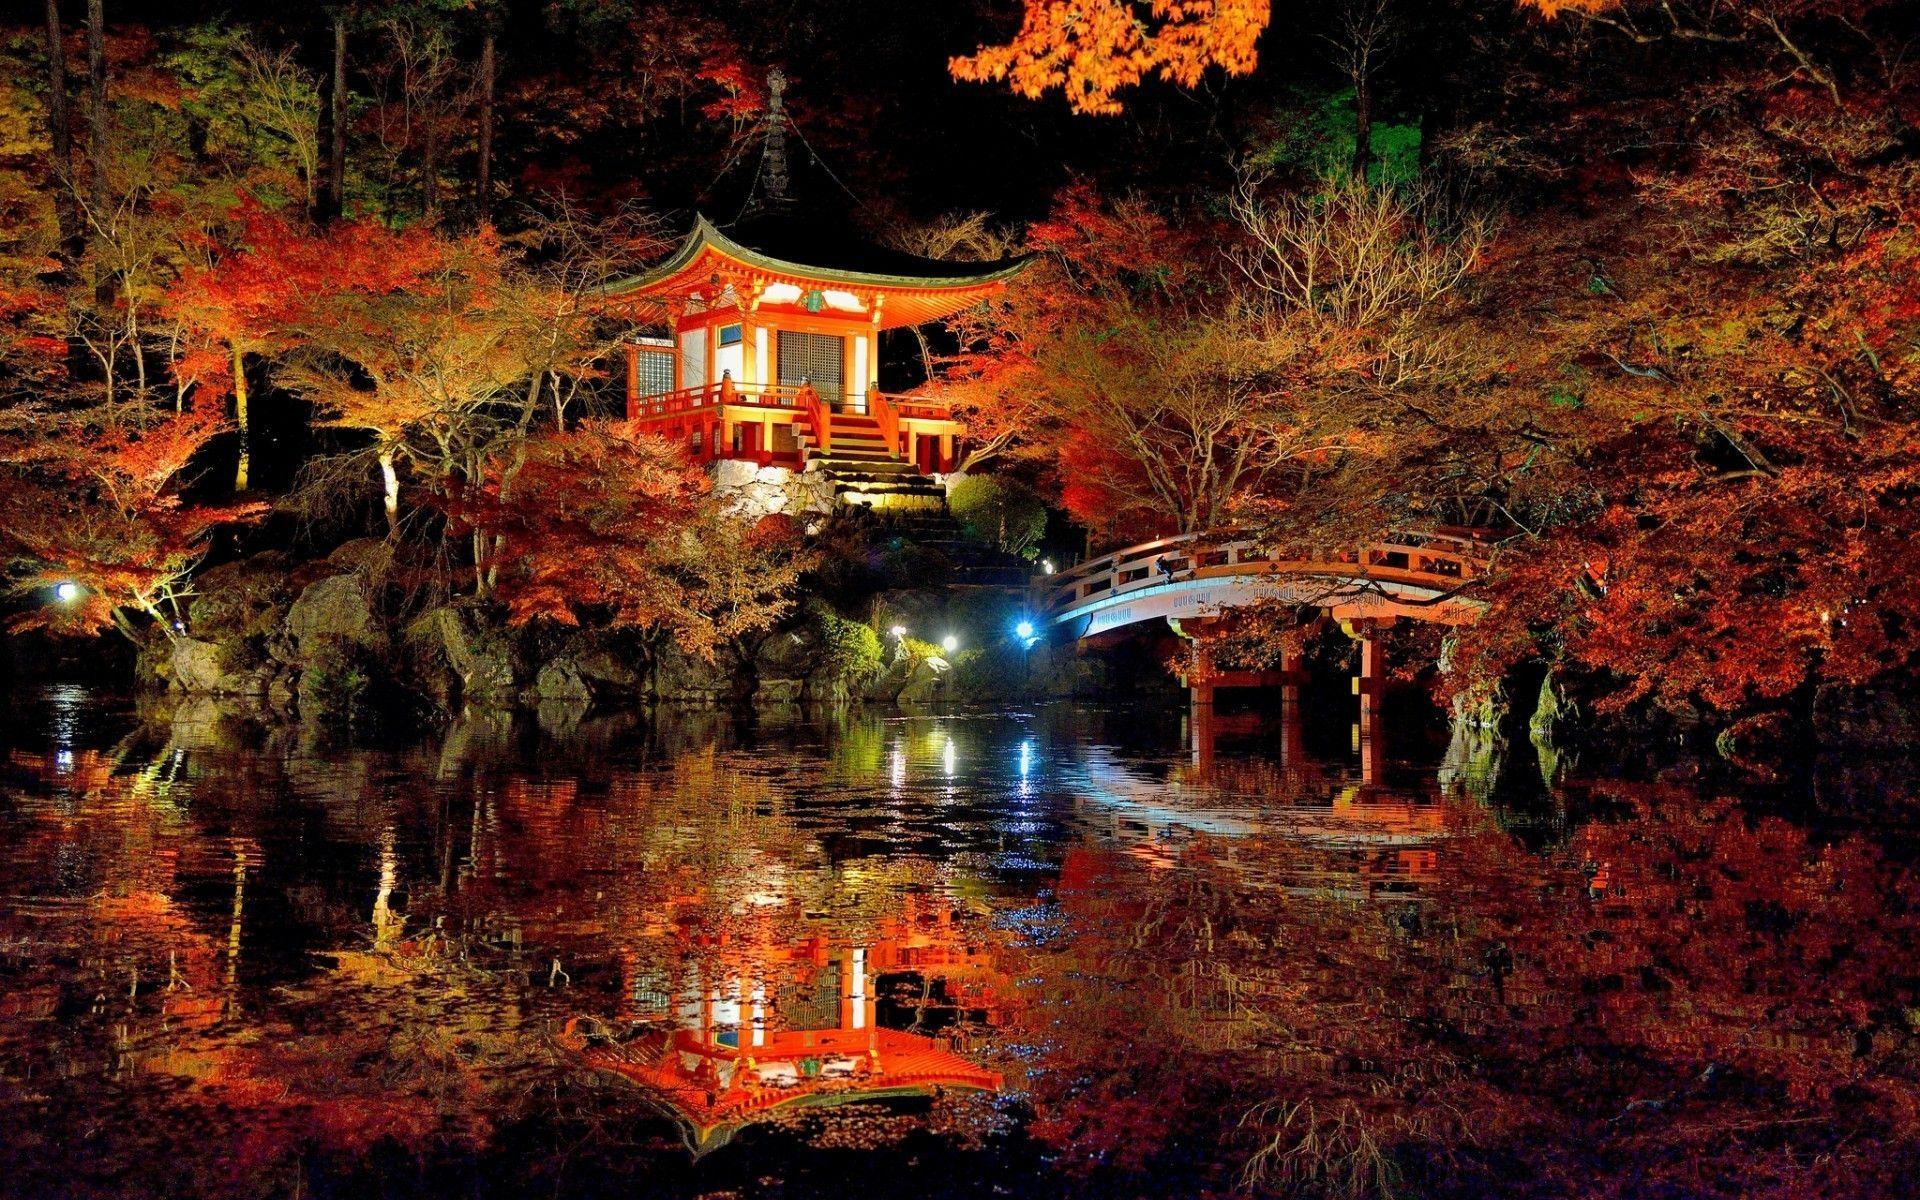 Japan 4K Wallpapers - Top Free Japan 4K Backgrounds ...